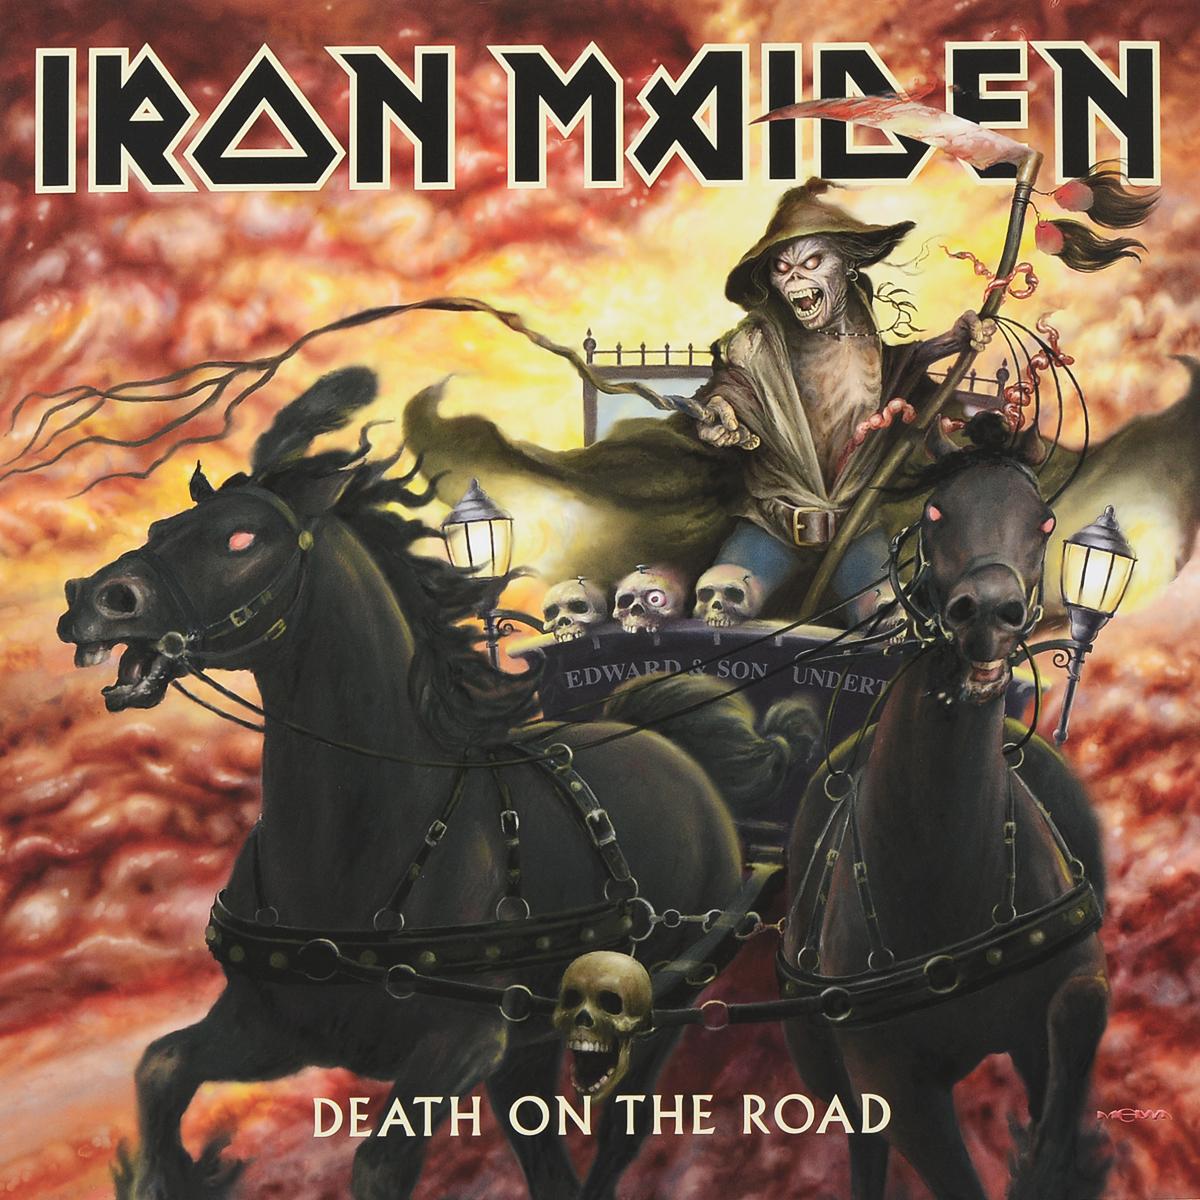 Iron Maiden Iron Maiden. Death On The Road (2 LP) on the bright side